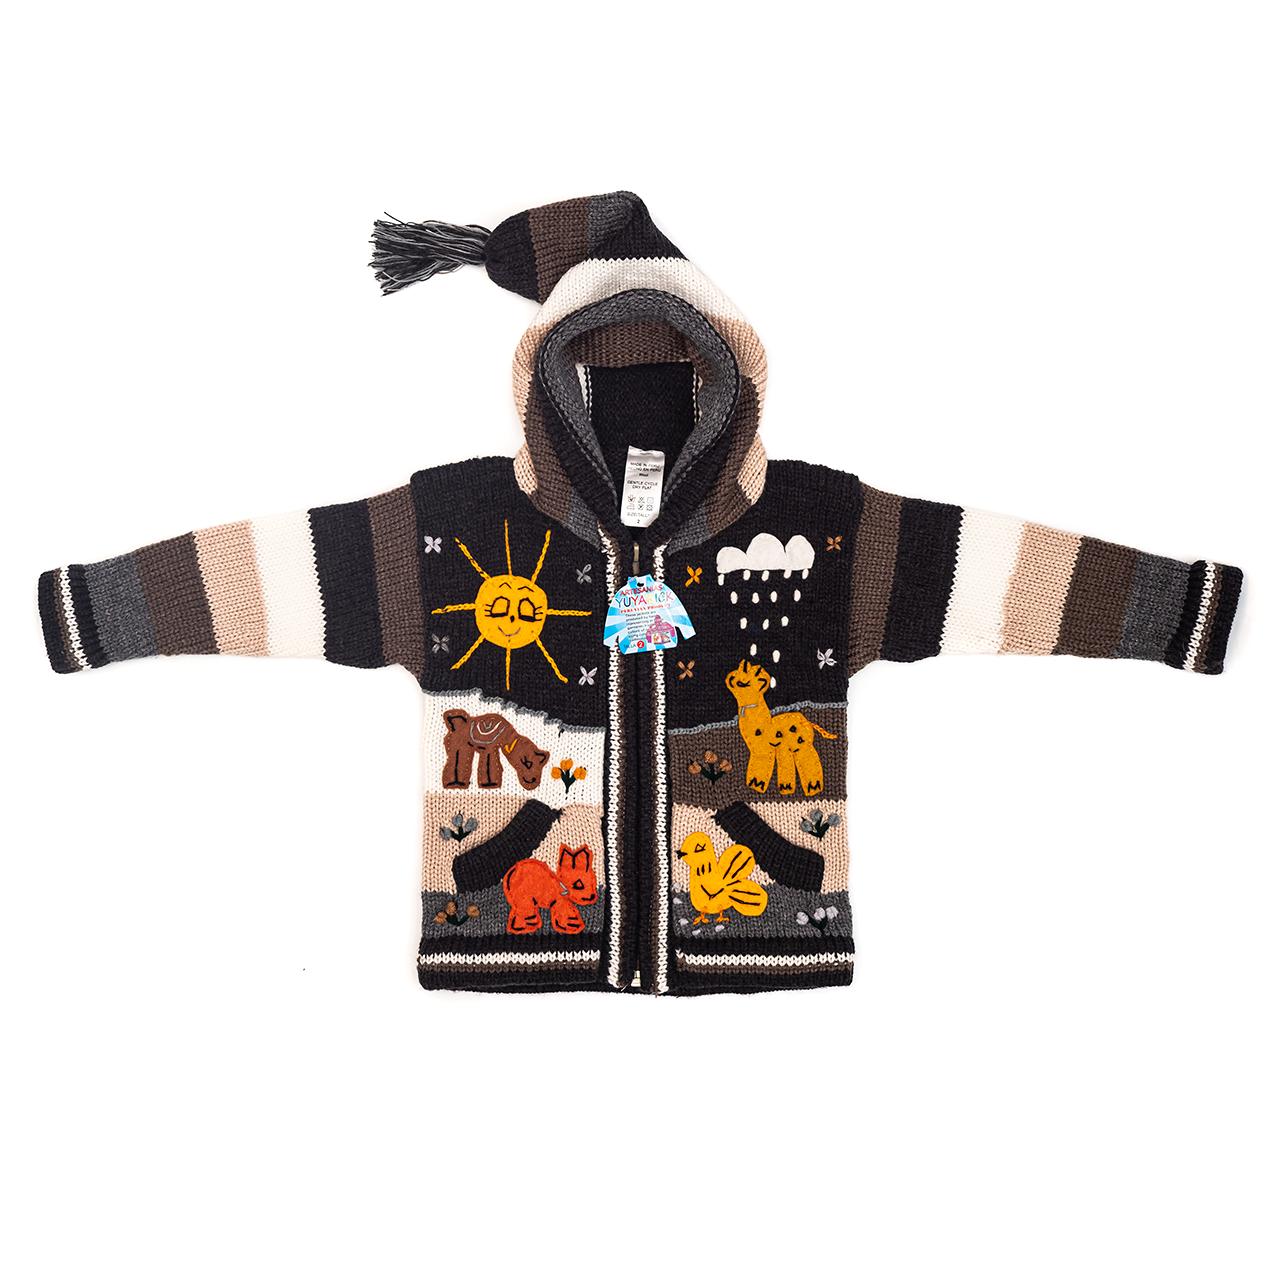 снимка на Детска жилетка с елфска качулка